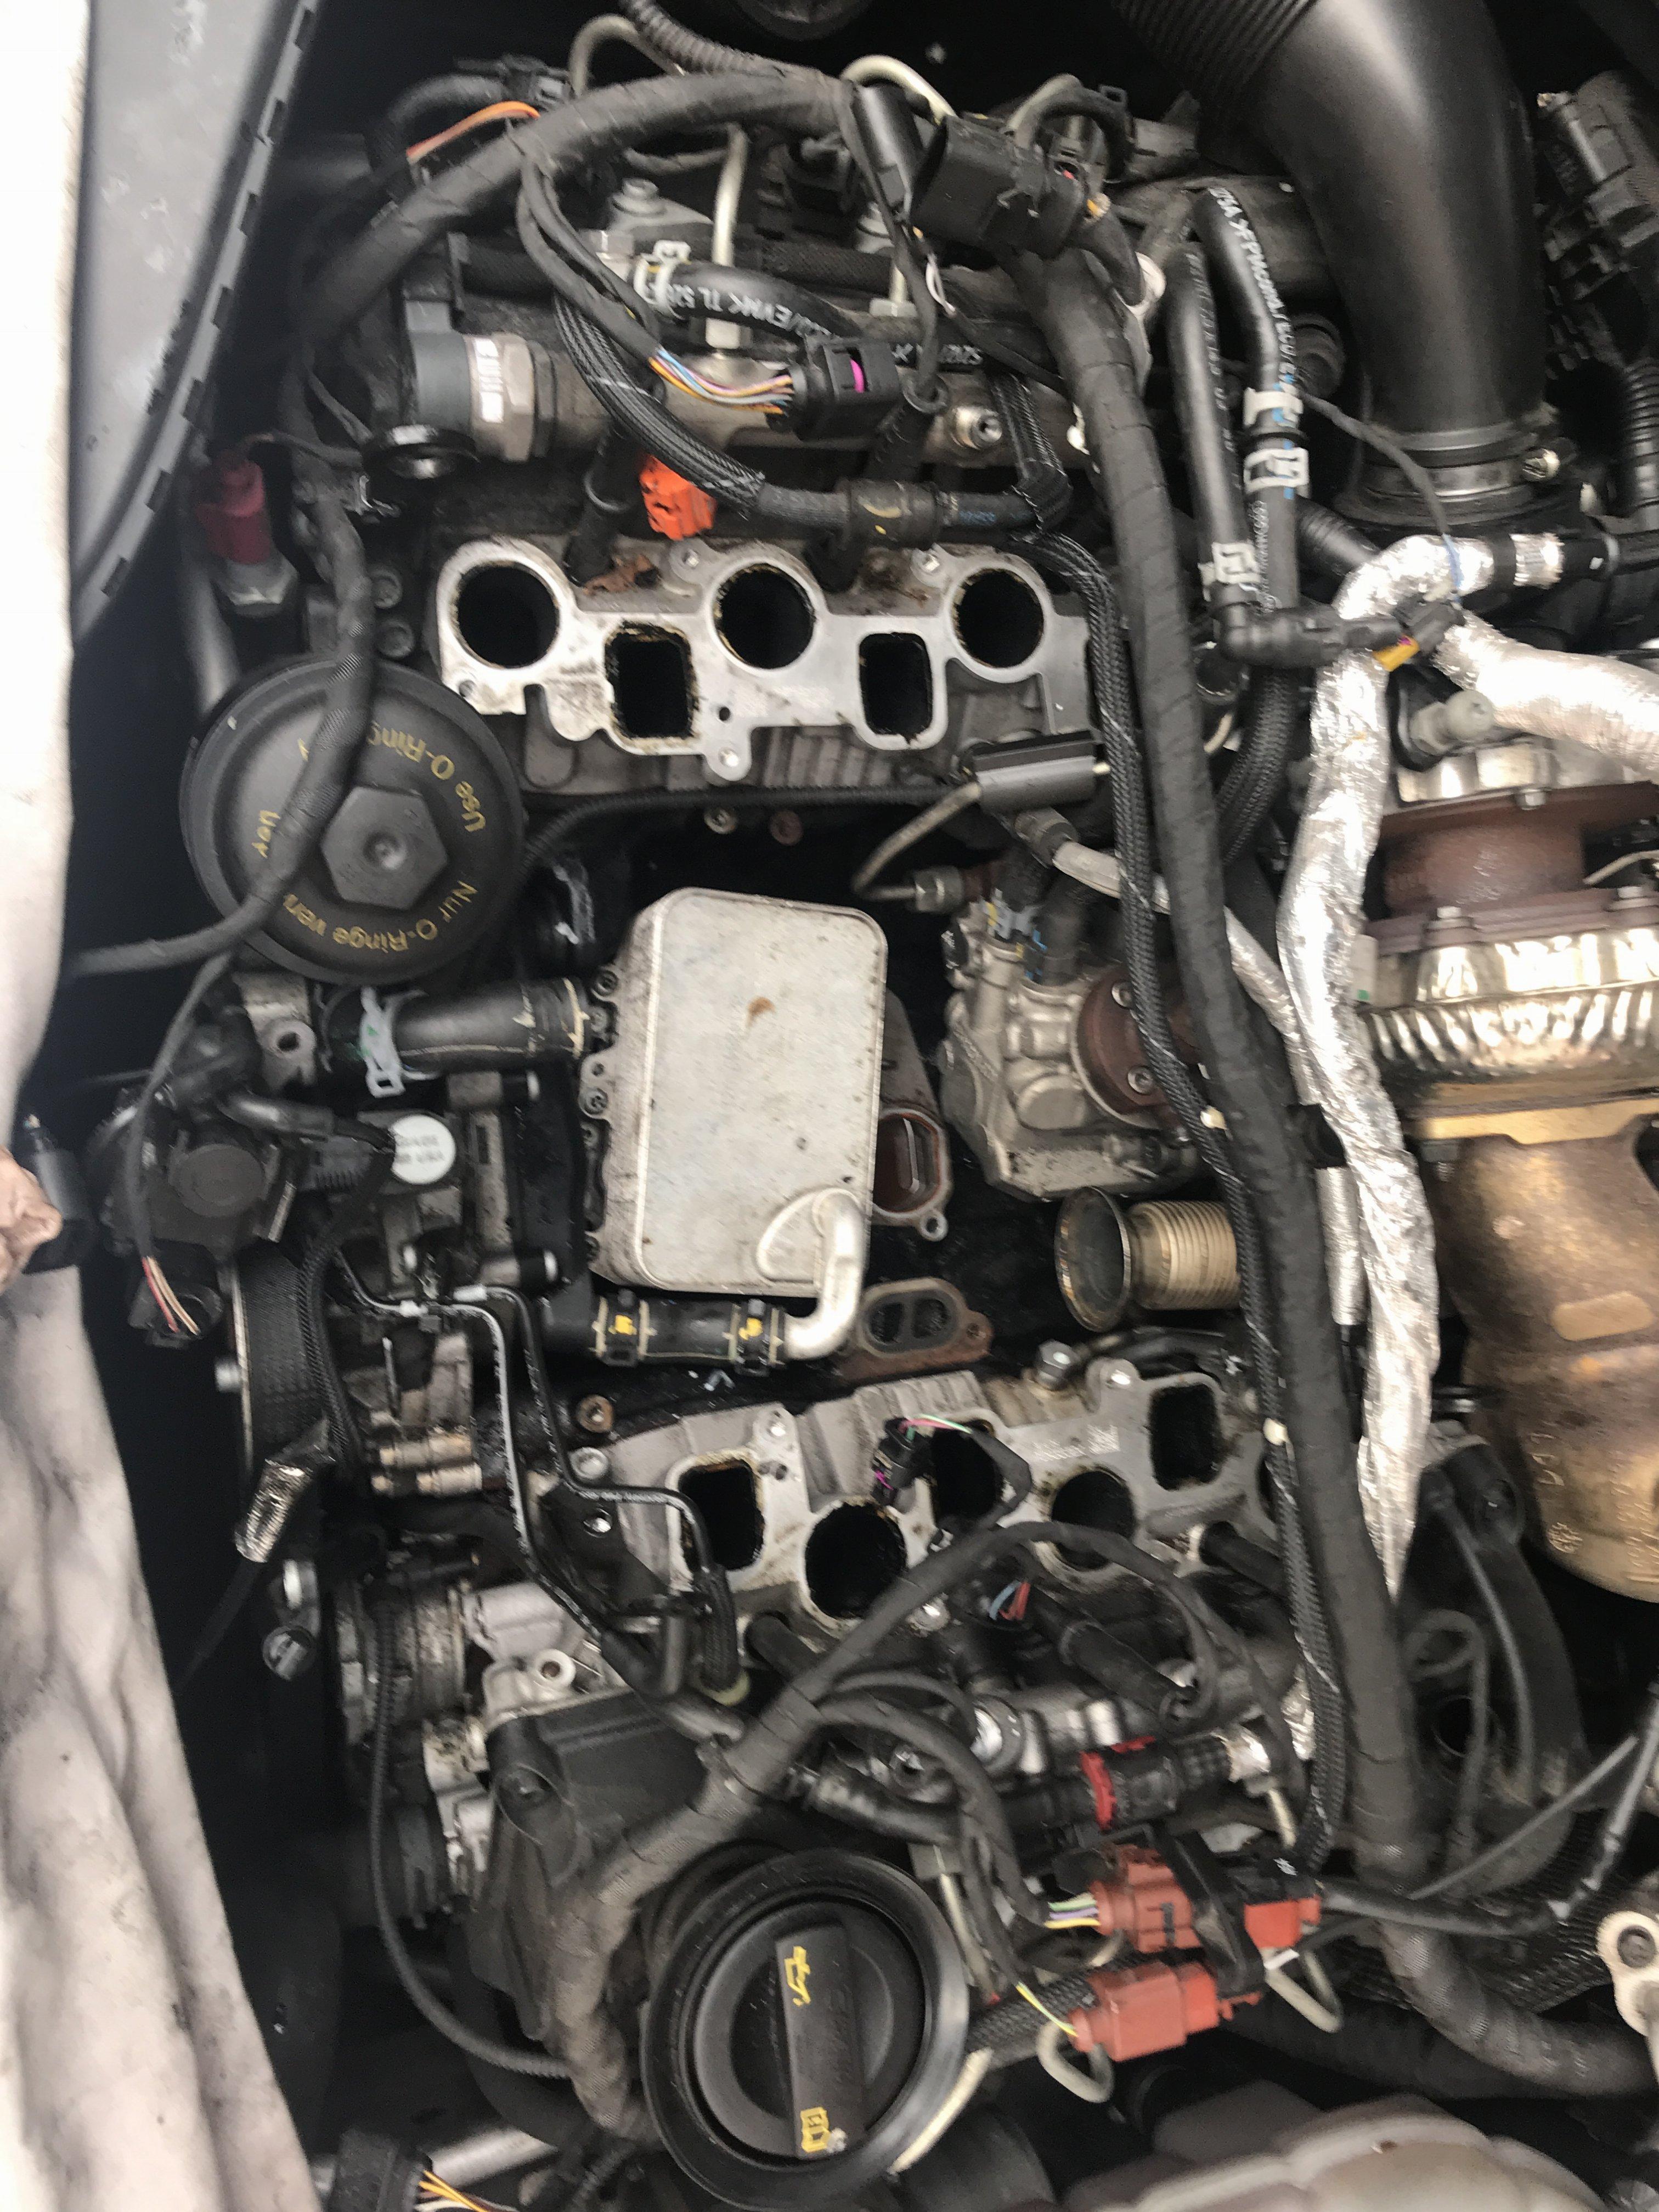 Coolant leaking | Audi-Sport net